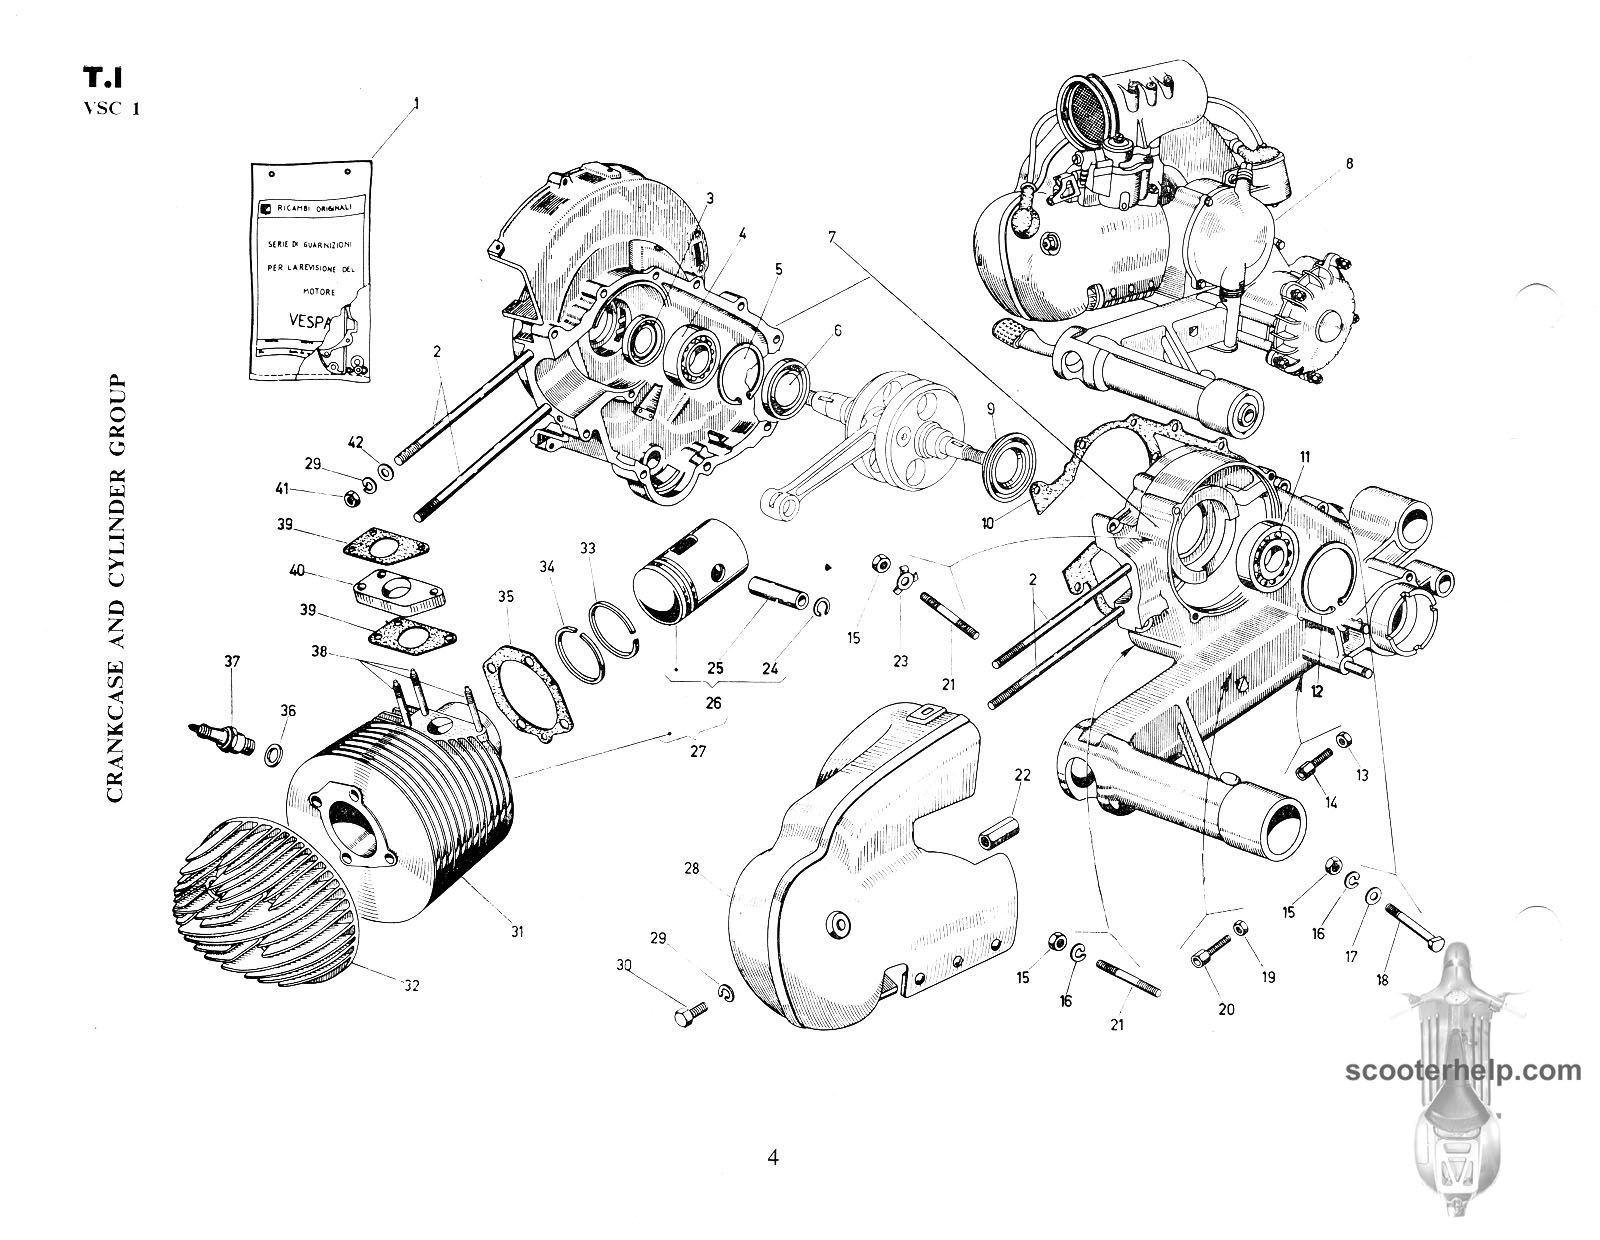 Vespa ss180 vsc1t parts book rh scooterhelp vespa et4 parts diagram vespa px parts diagram